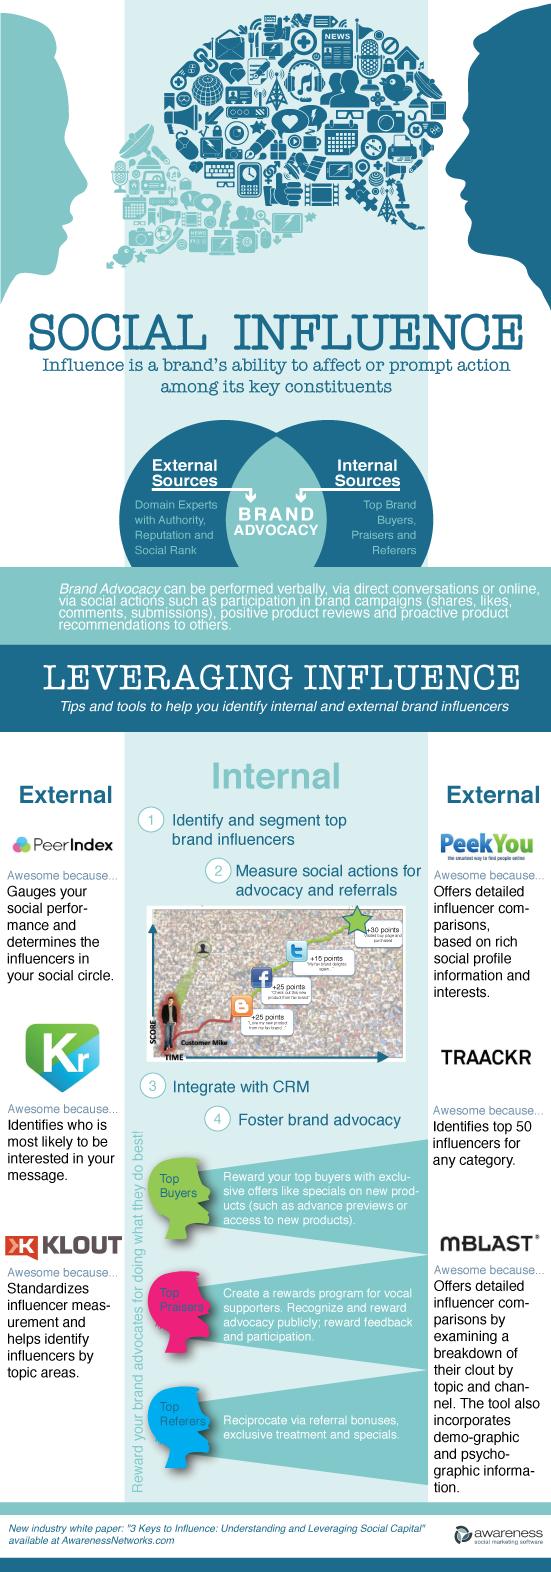 como aprovechar la influencia social